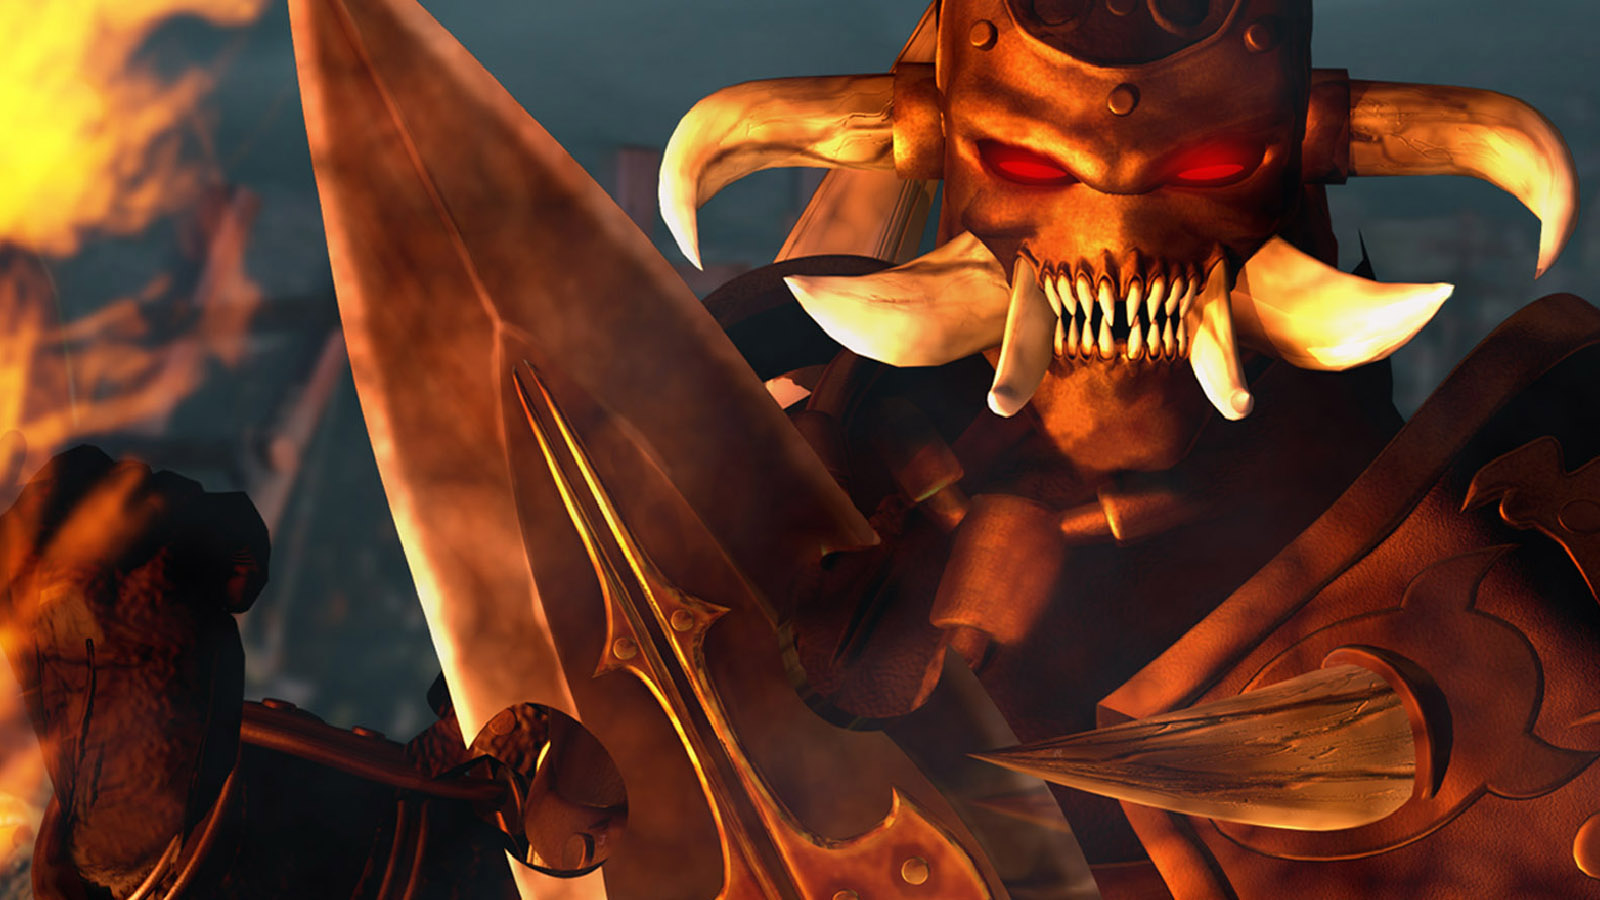 Severance: Blade of Darkness - Conquest v1.1